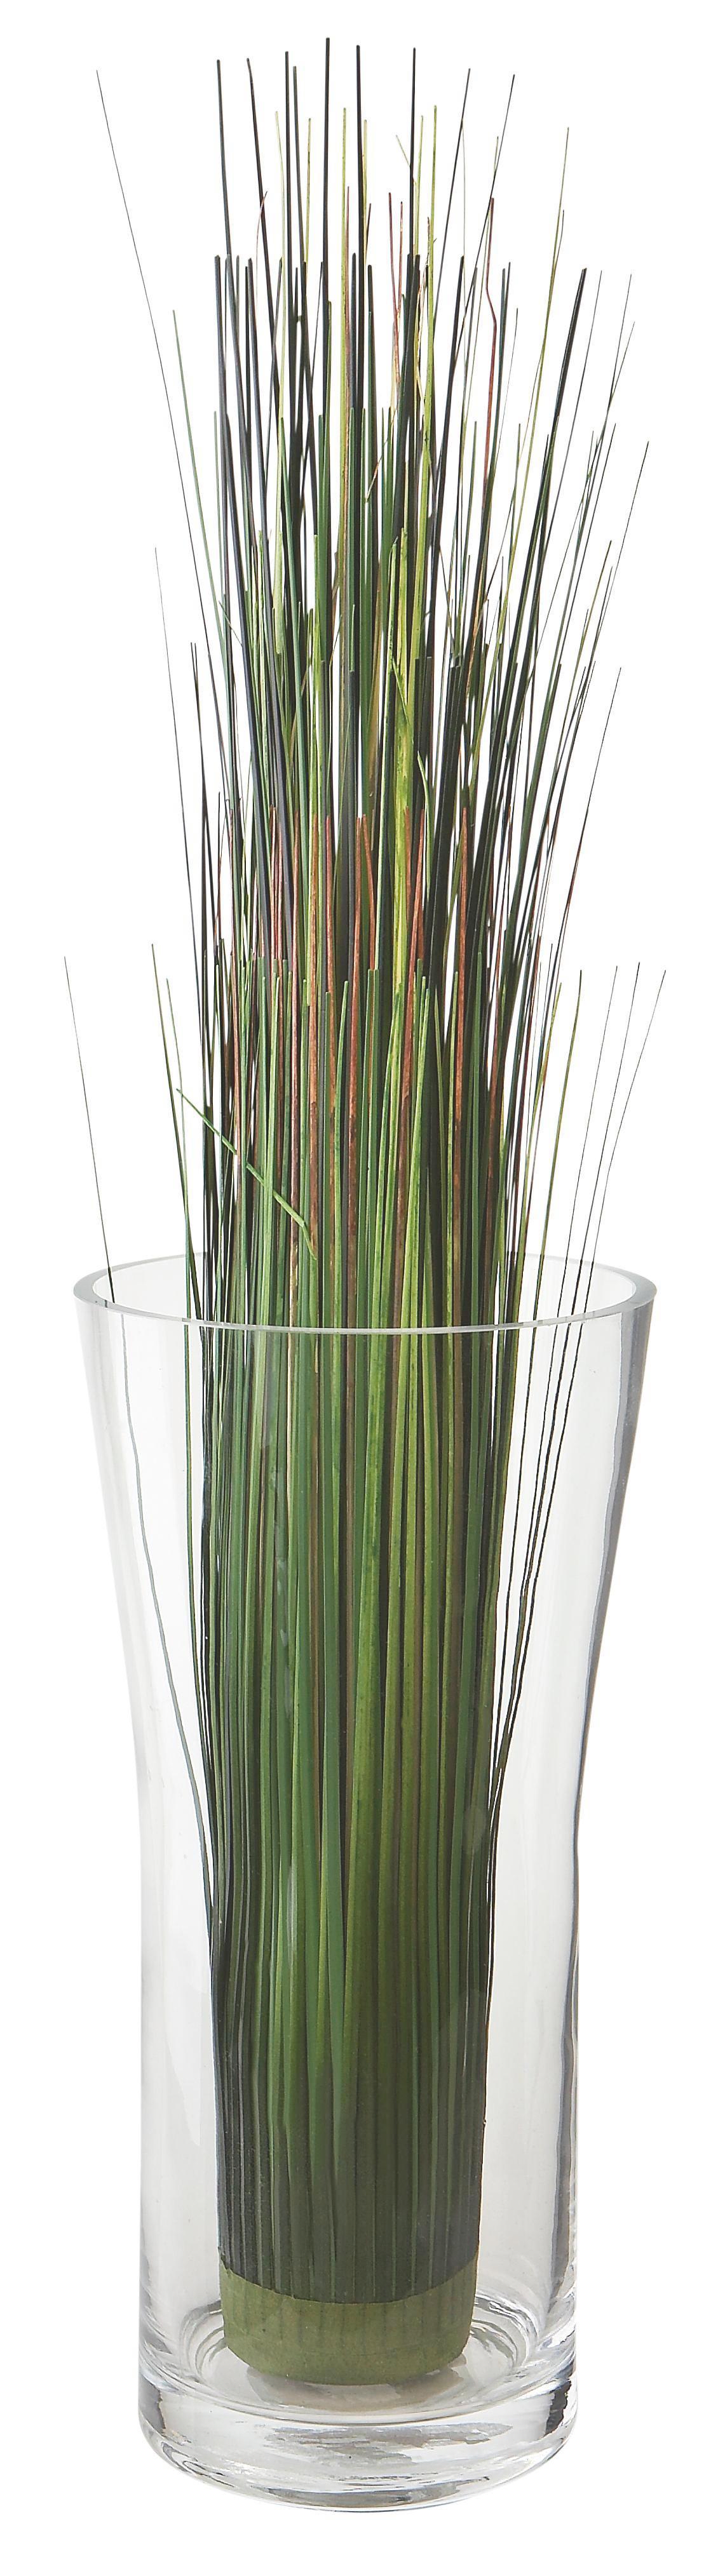 Fűcsomó Markus - zöld, műanyag (5,5/48cm)